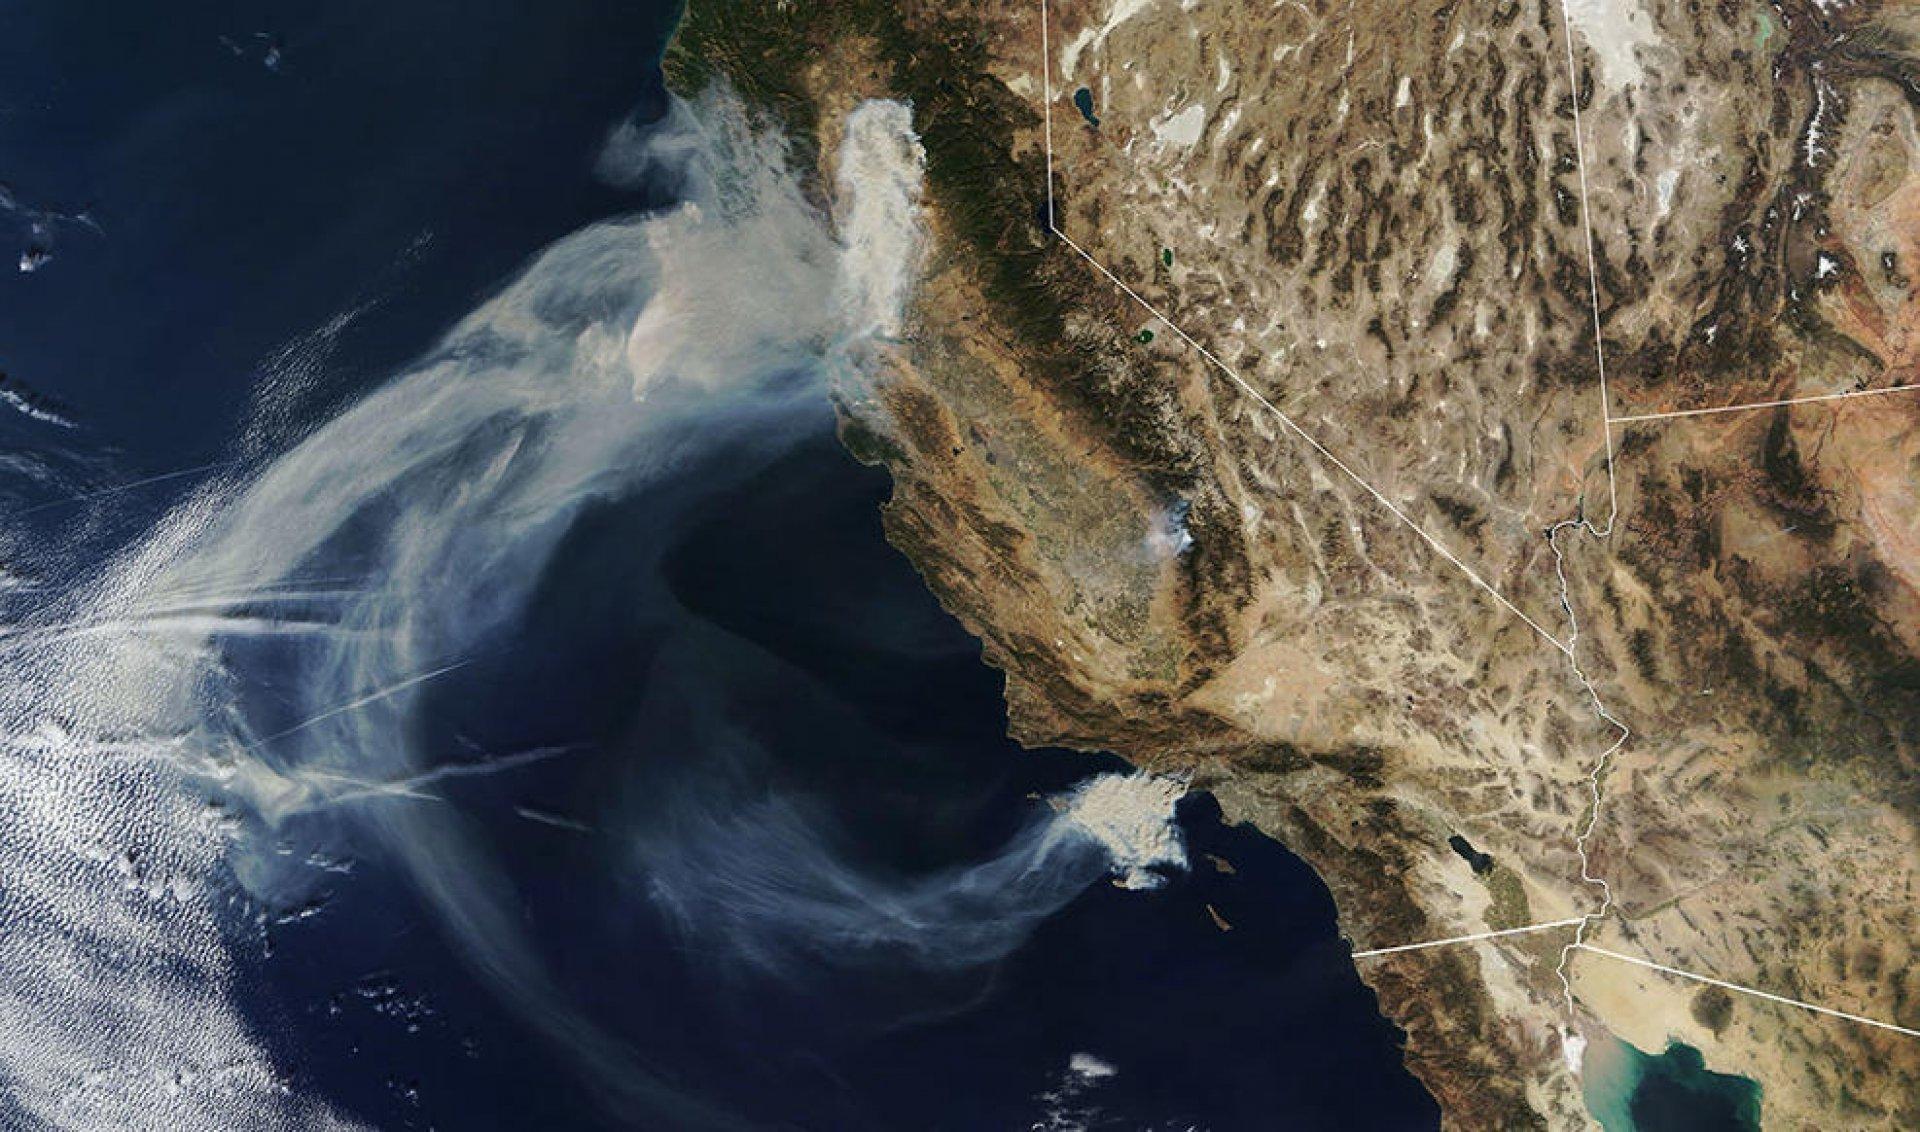 wildfire-woolsey-california_tmo_2018313_lrg.jpg